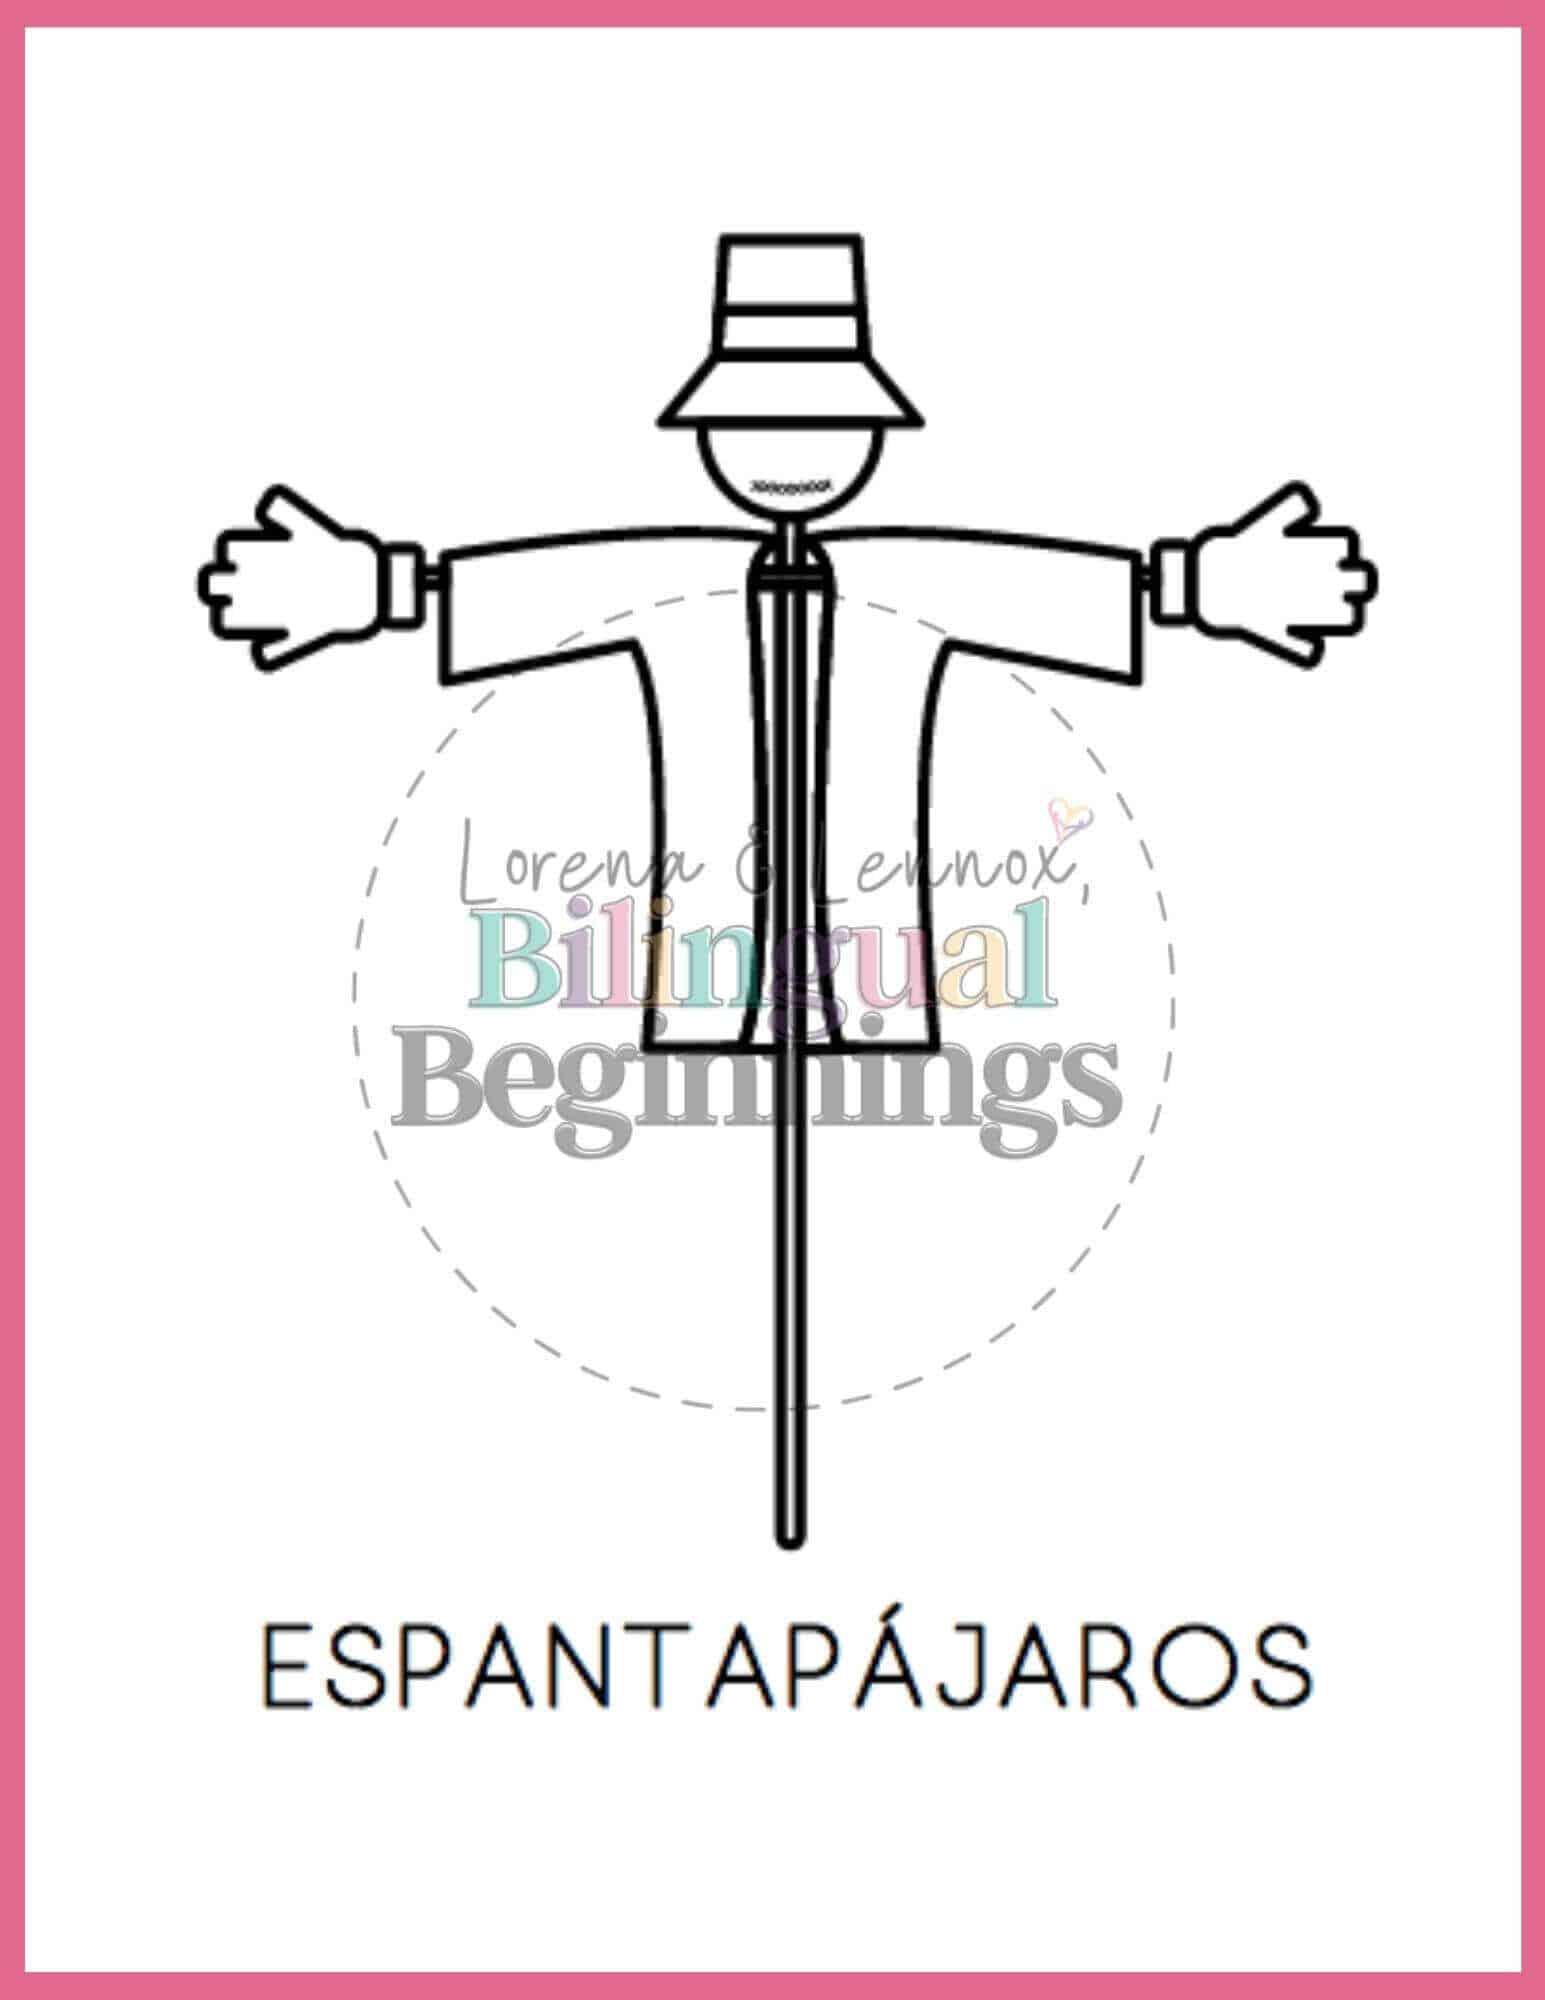 Fall printables in Spanish- coloring pages- Espantapájaros